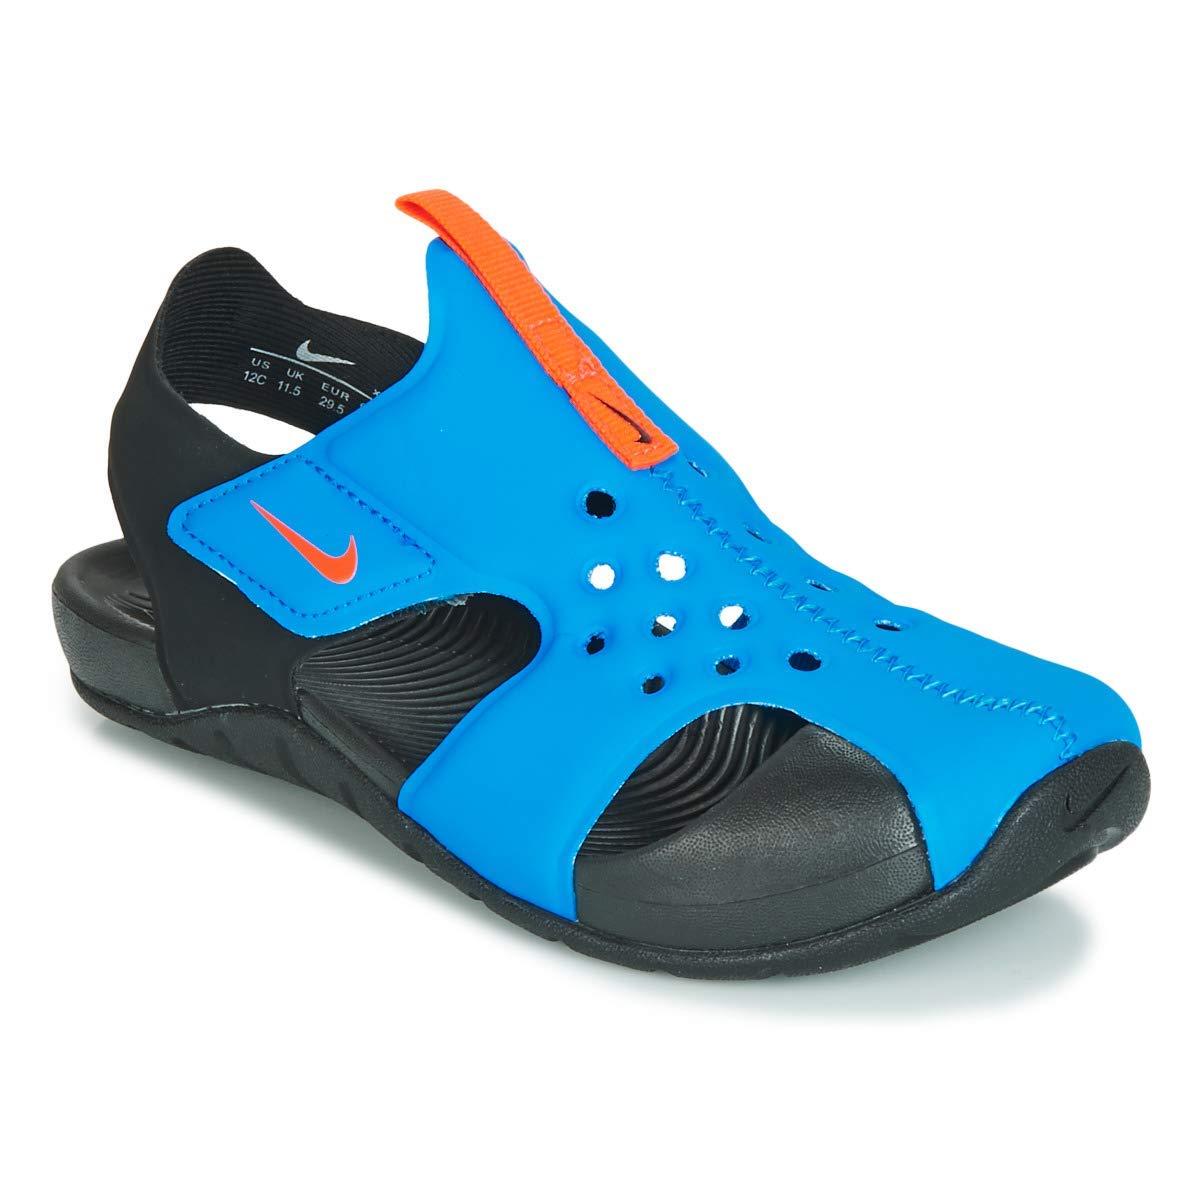 oferta fábrica auténtica precio bajo Mua Nike Little Girl's Sunray Protect 2 Sandals trên Amazon Mỹ ...